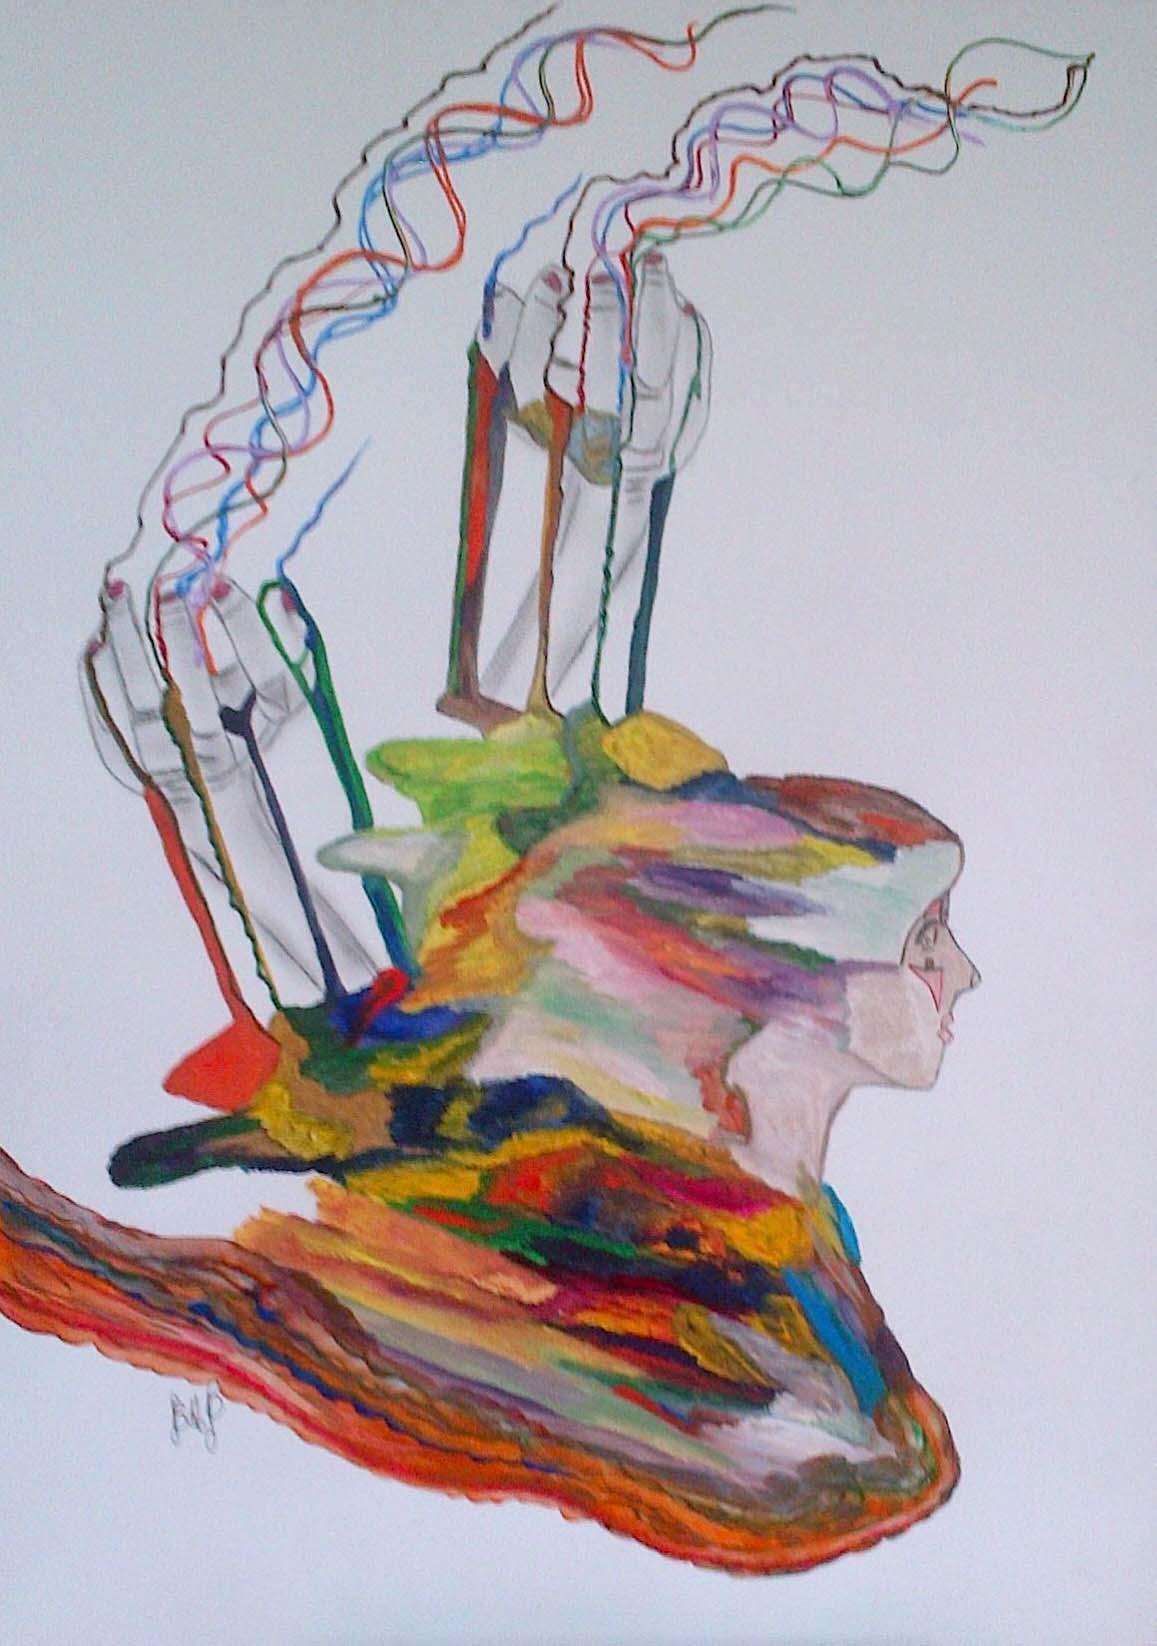 bd-aquarelle-n-857-artiste-3